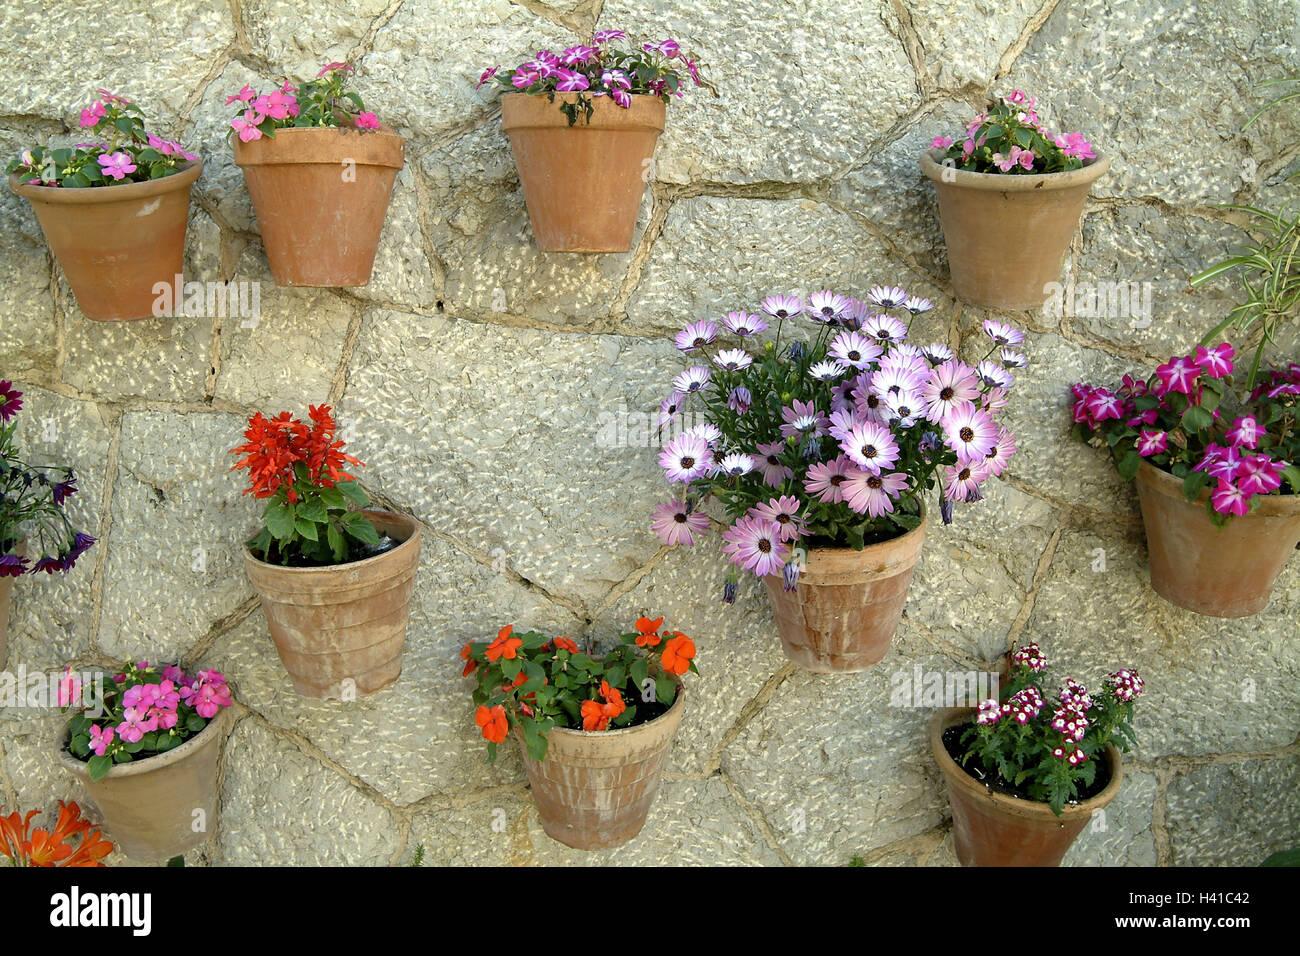 Muralla De Piedra Natural Macetas Flores Diferentemente